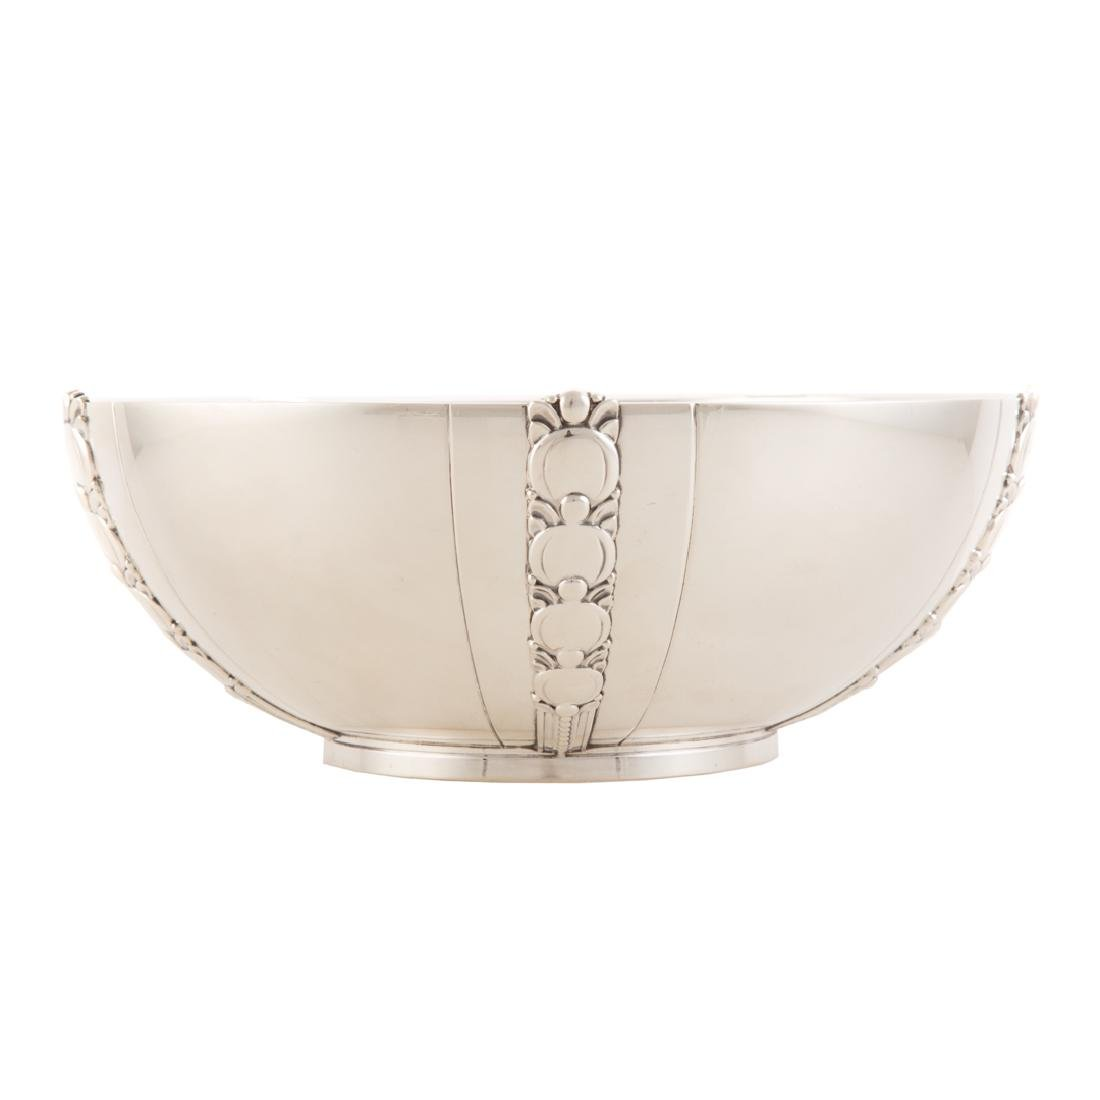 Tiffany & Co. sterling center bowl Tomato pattern